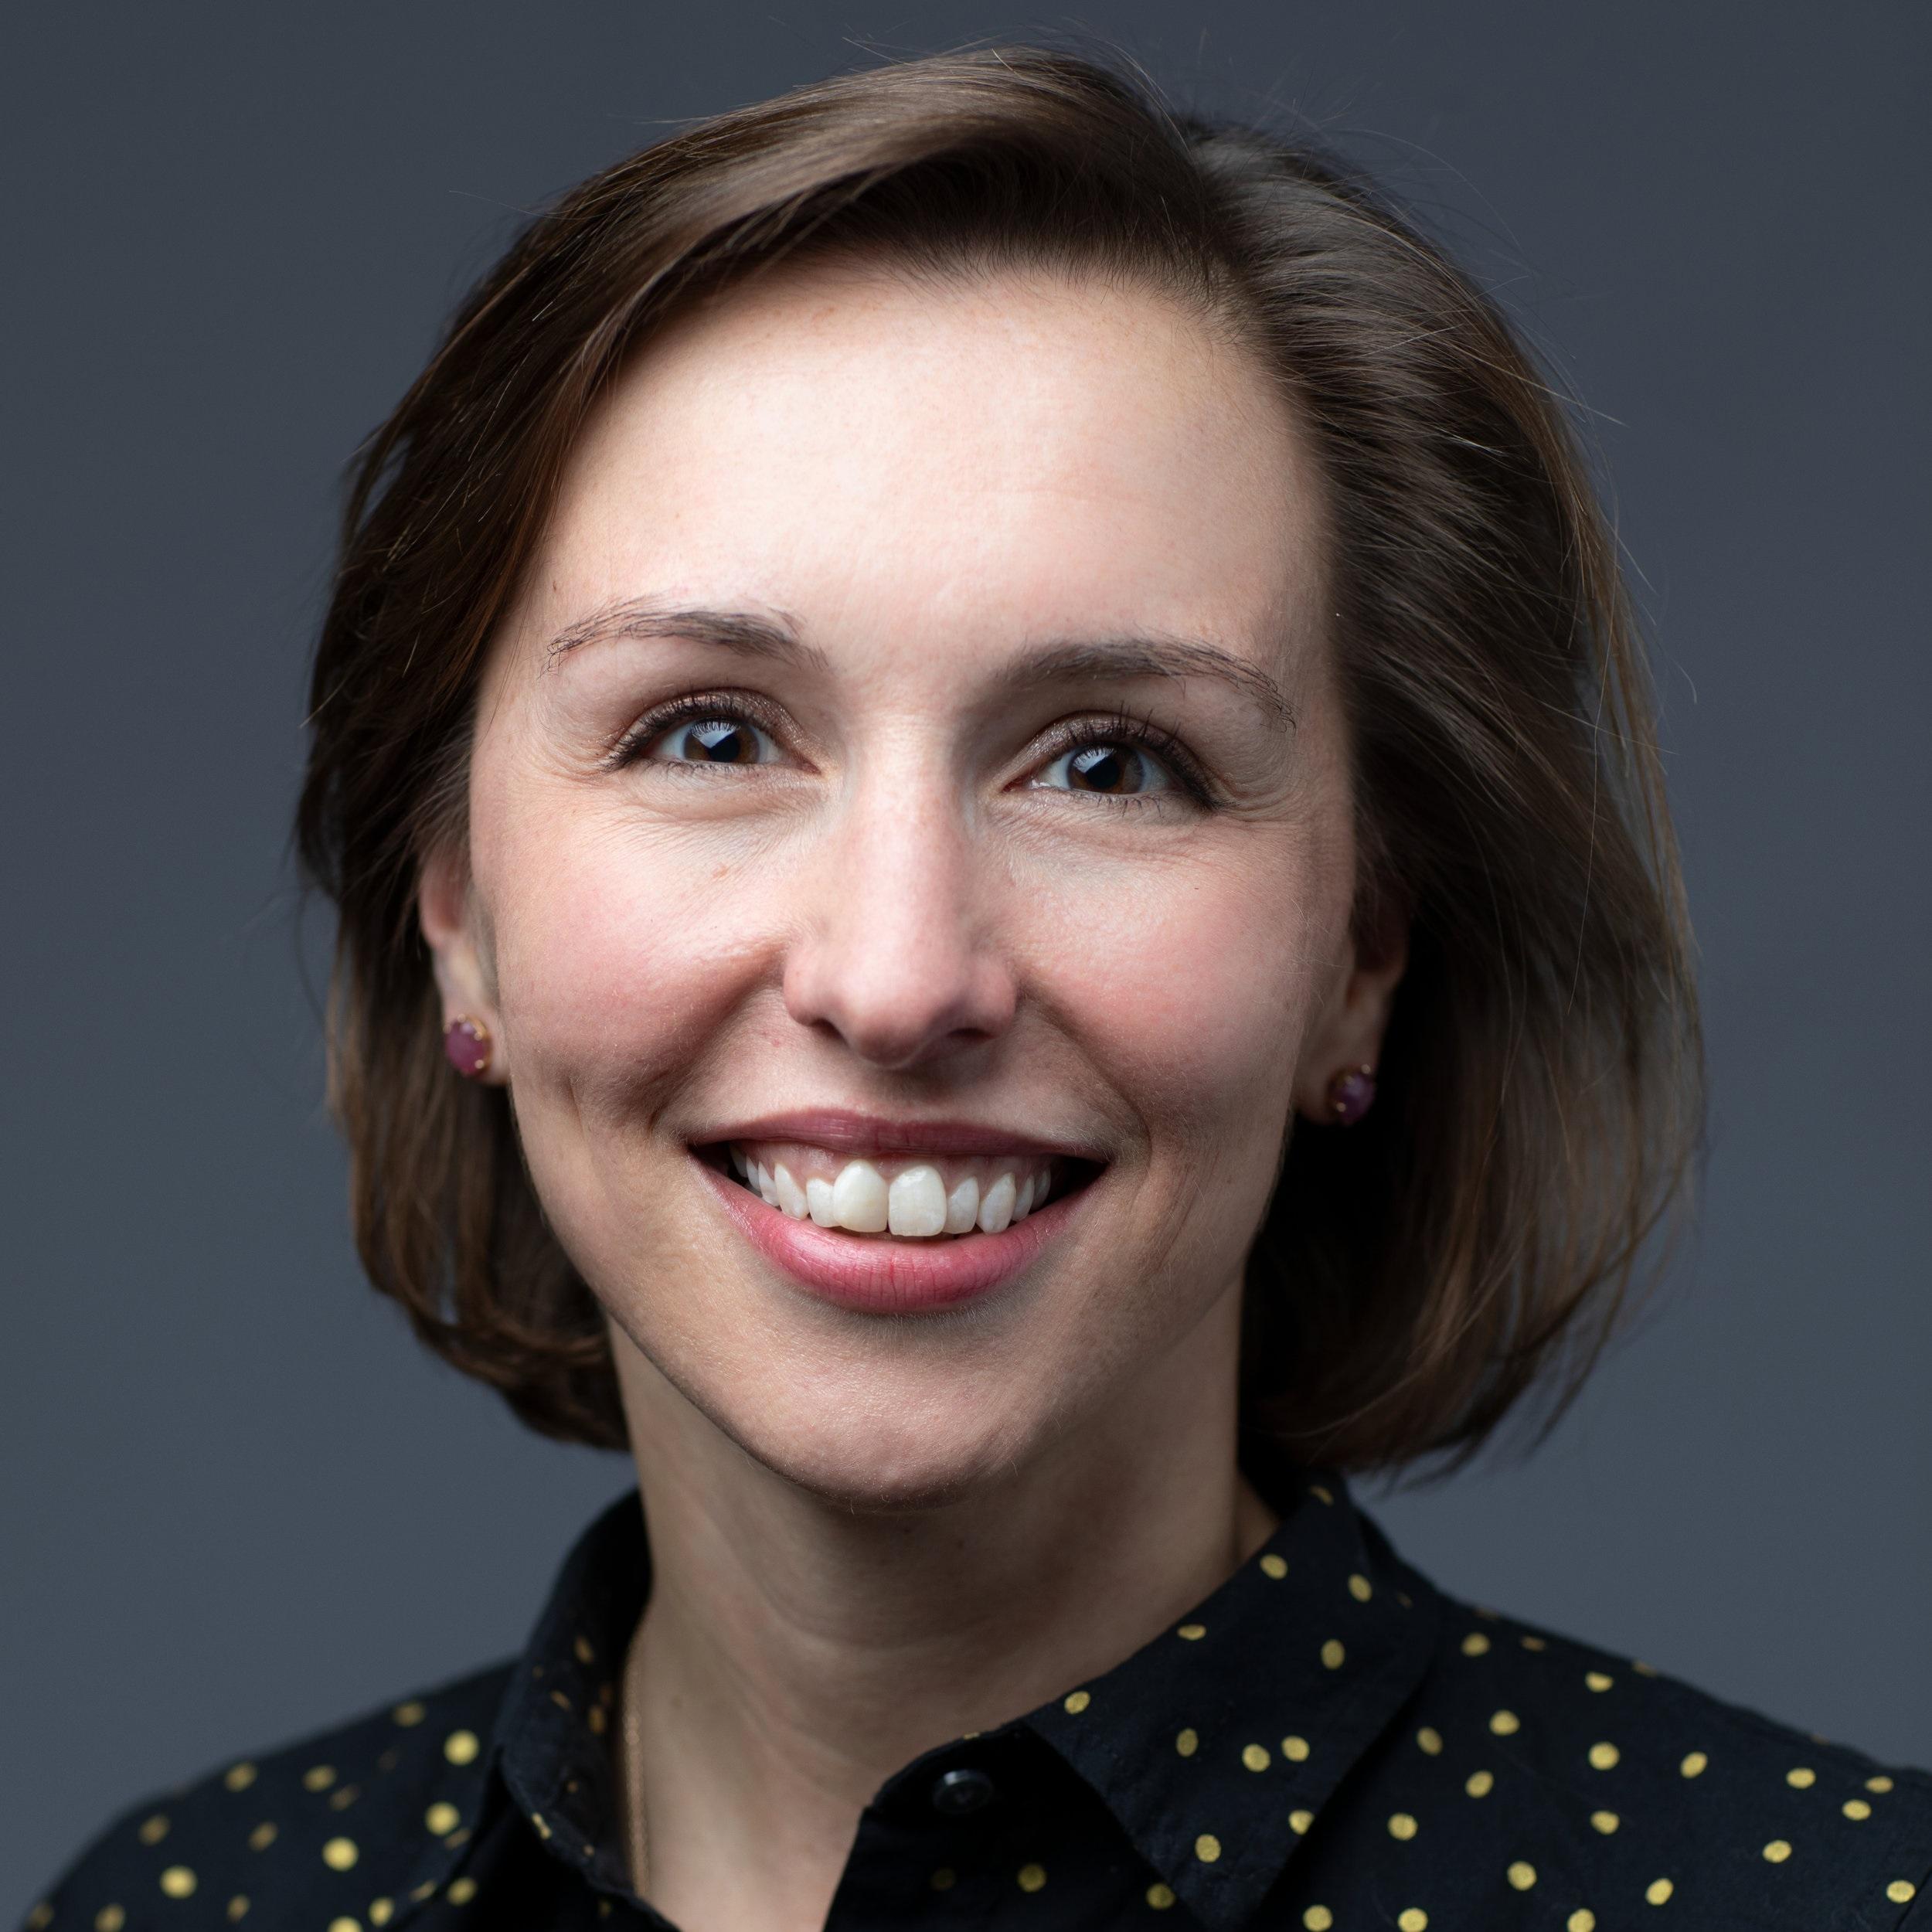 Megan Cummings Hansen, Washington D.C